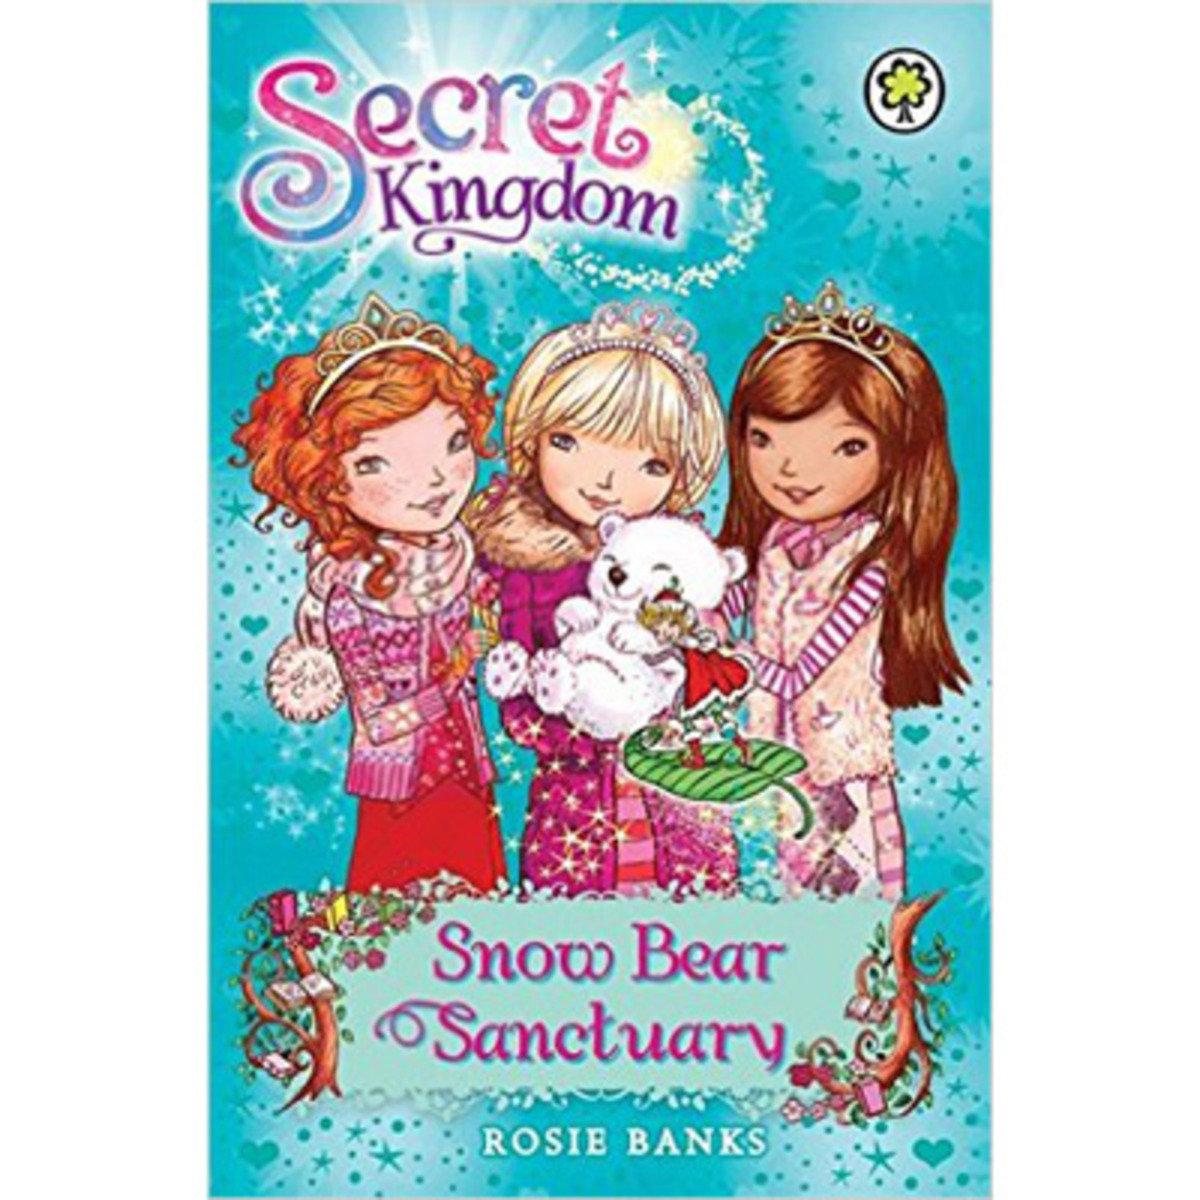 SECRET KINGDOM #15 SNOW BEAR SANCTUARY 9781408323403